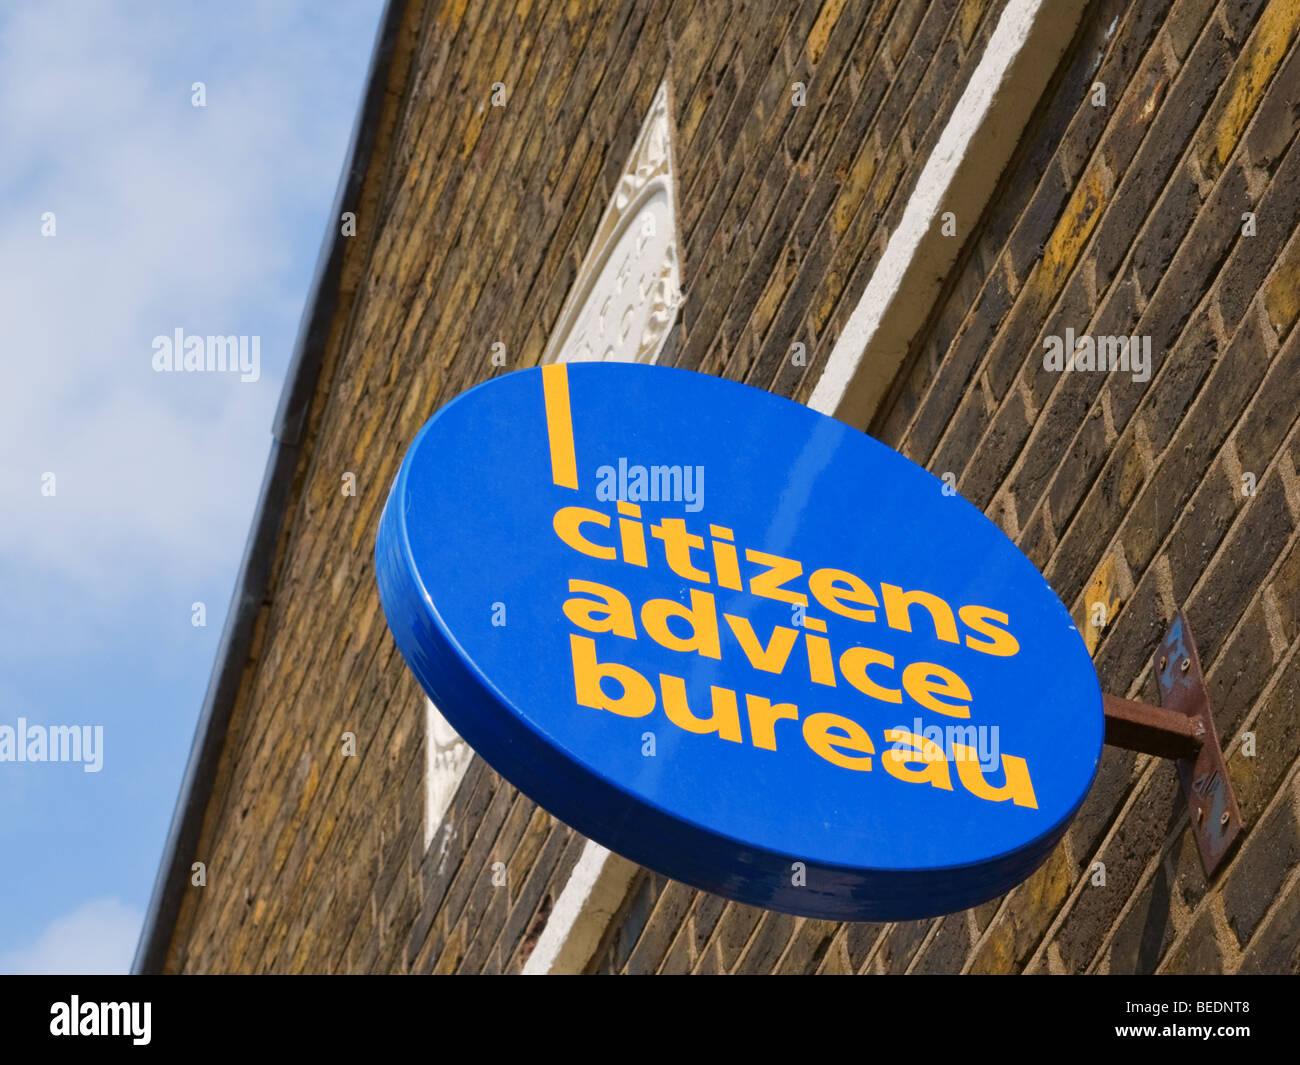 Citizens Advice Bureau high street shop sign - Stock Image